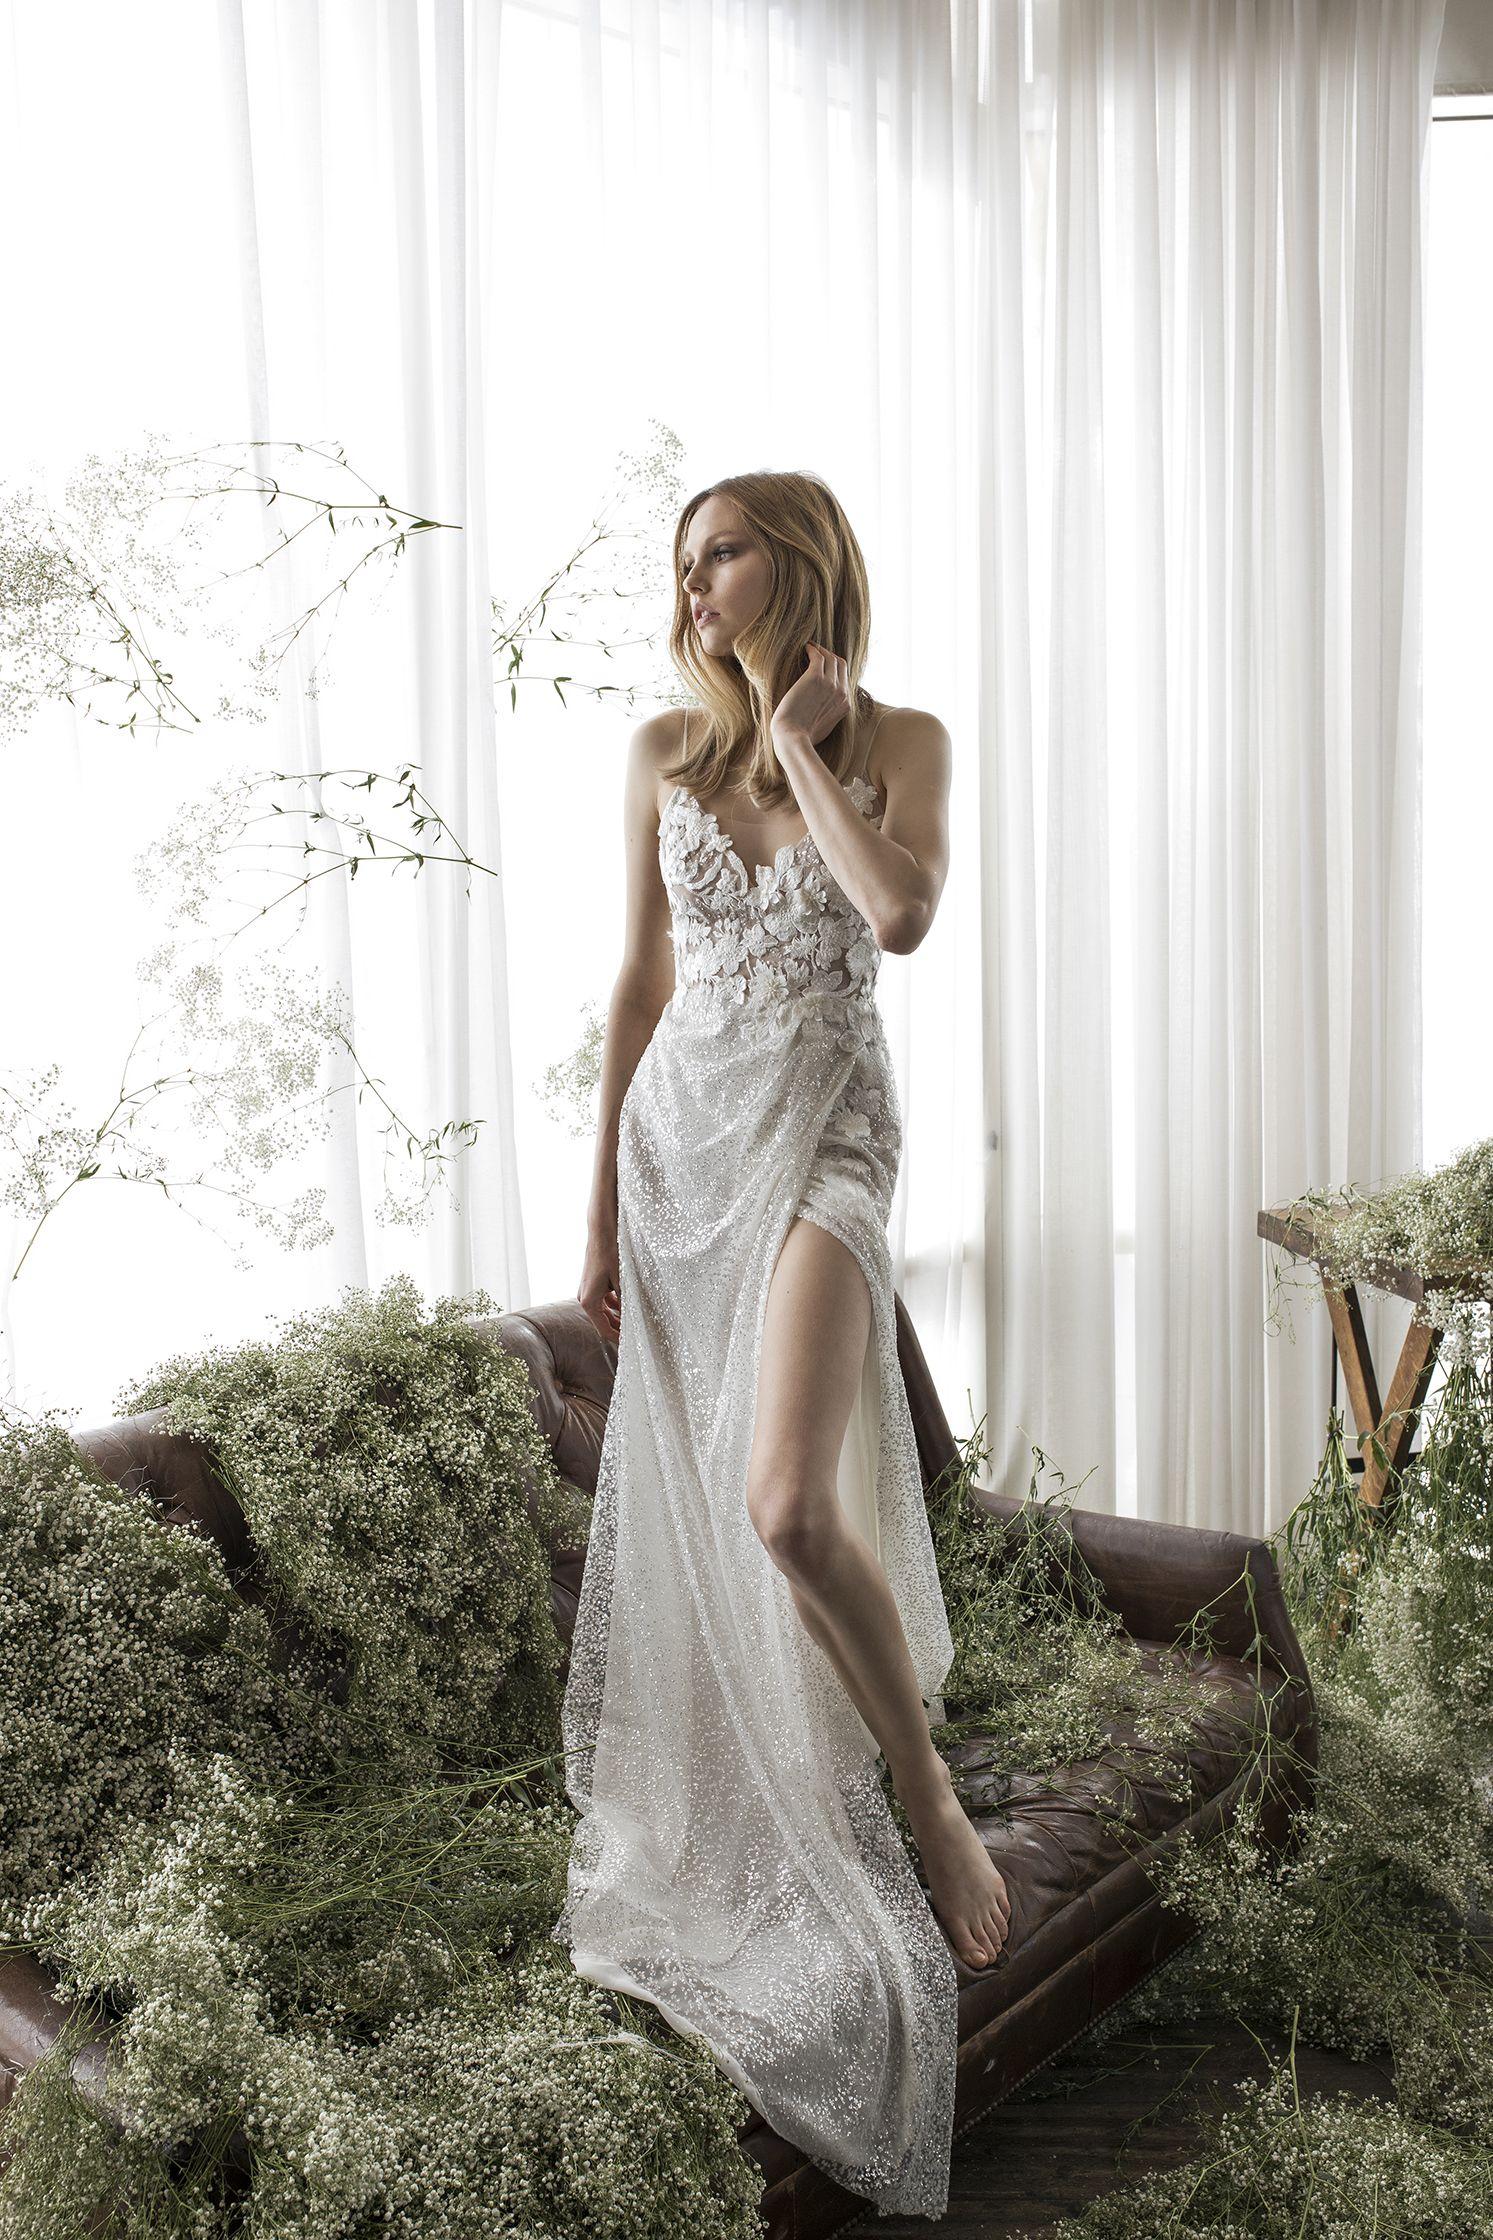 Handmade wedding dress  Elia Vatine  collection urban bride Wedding Clothing Handmade